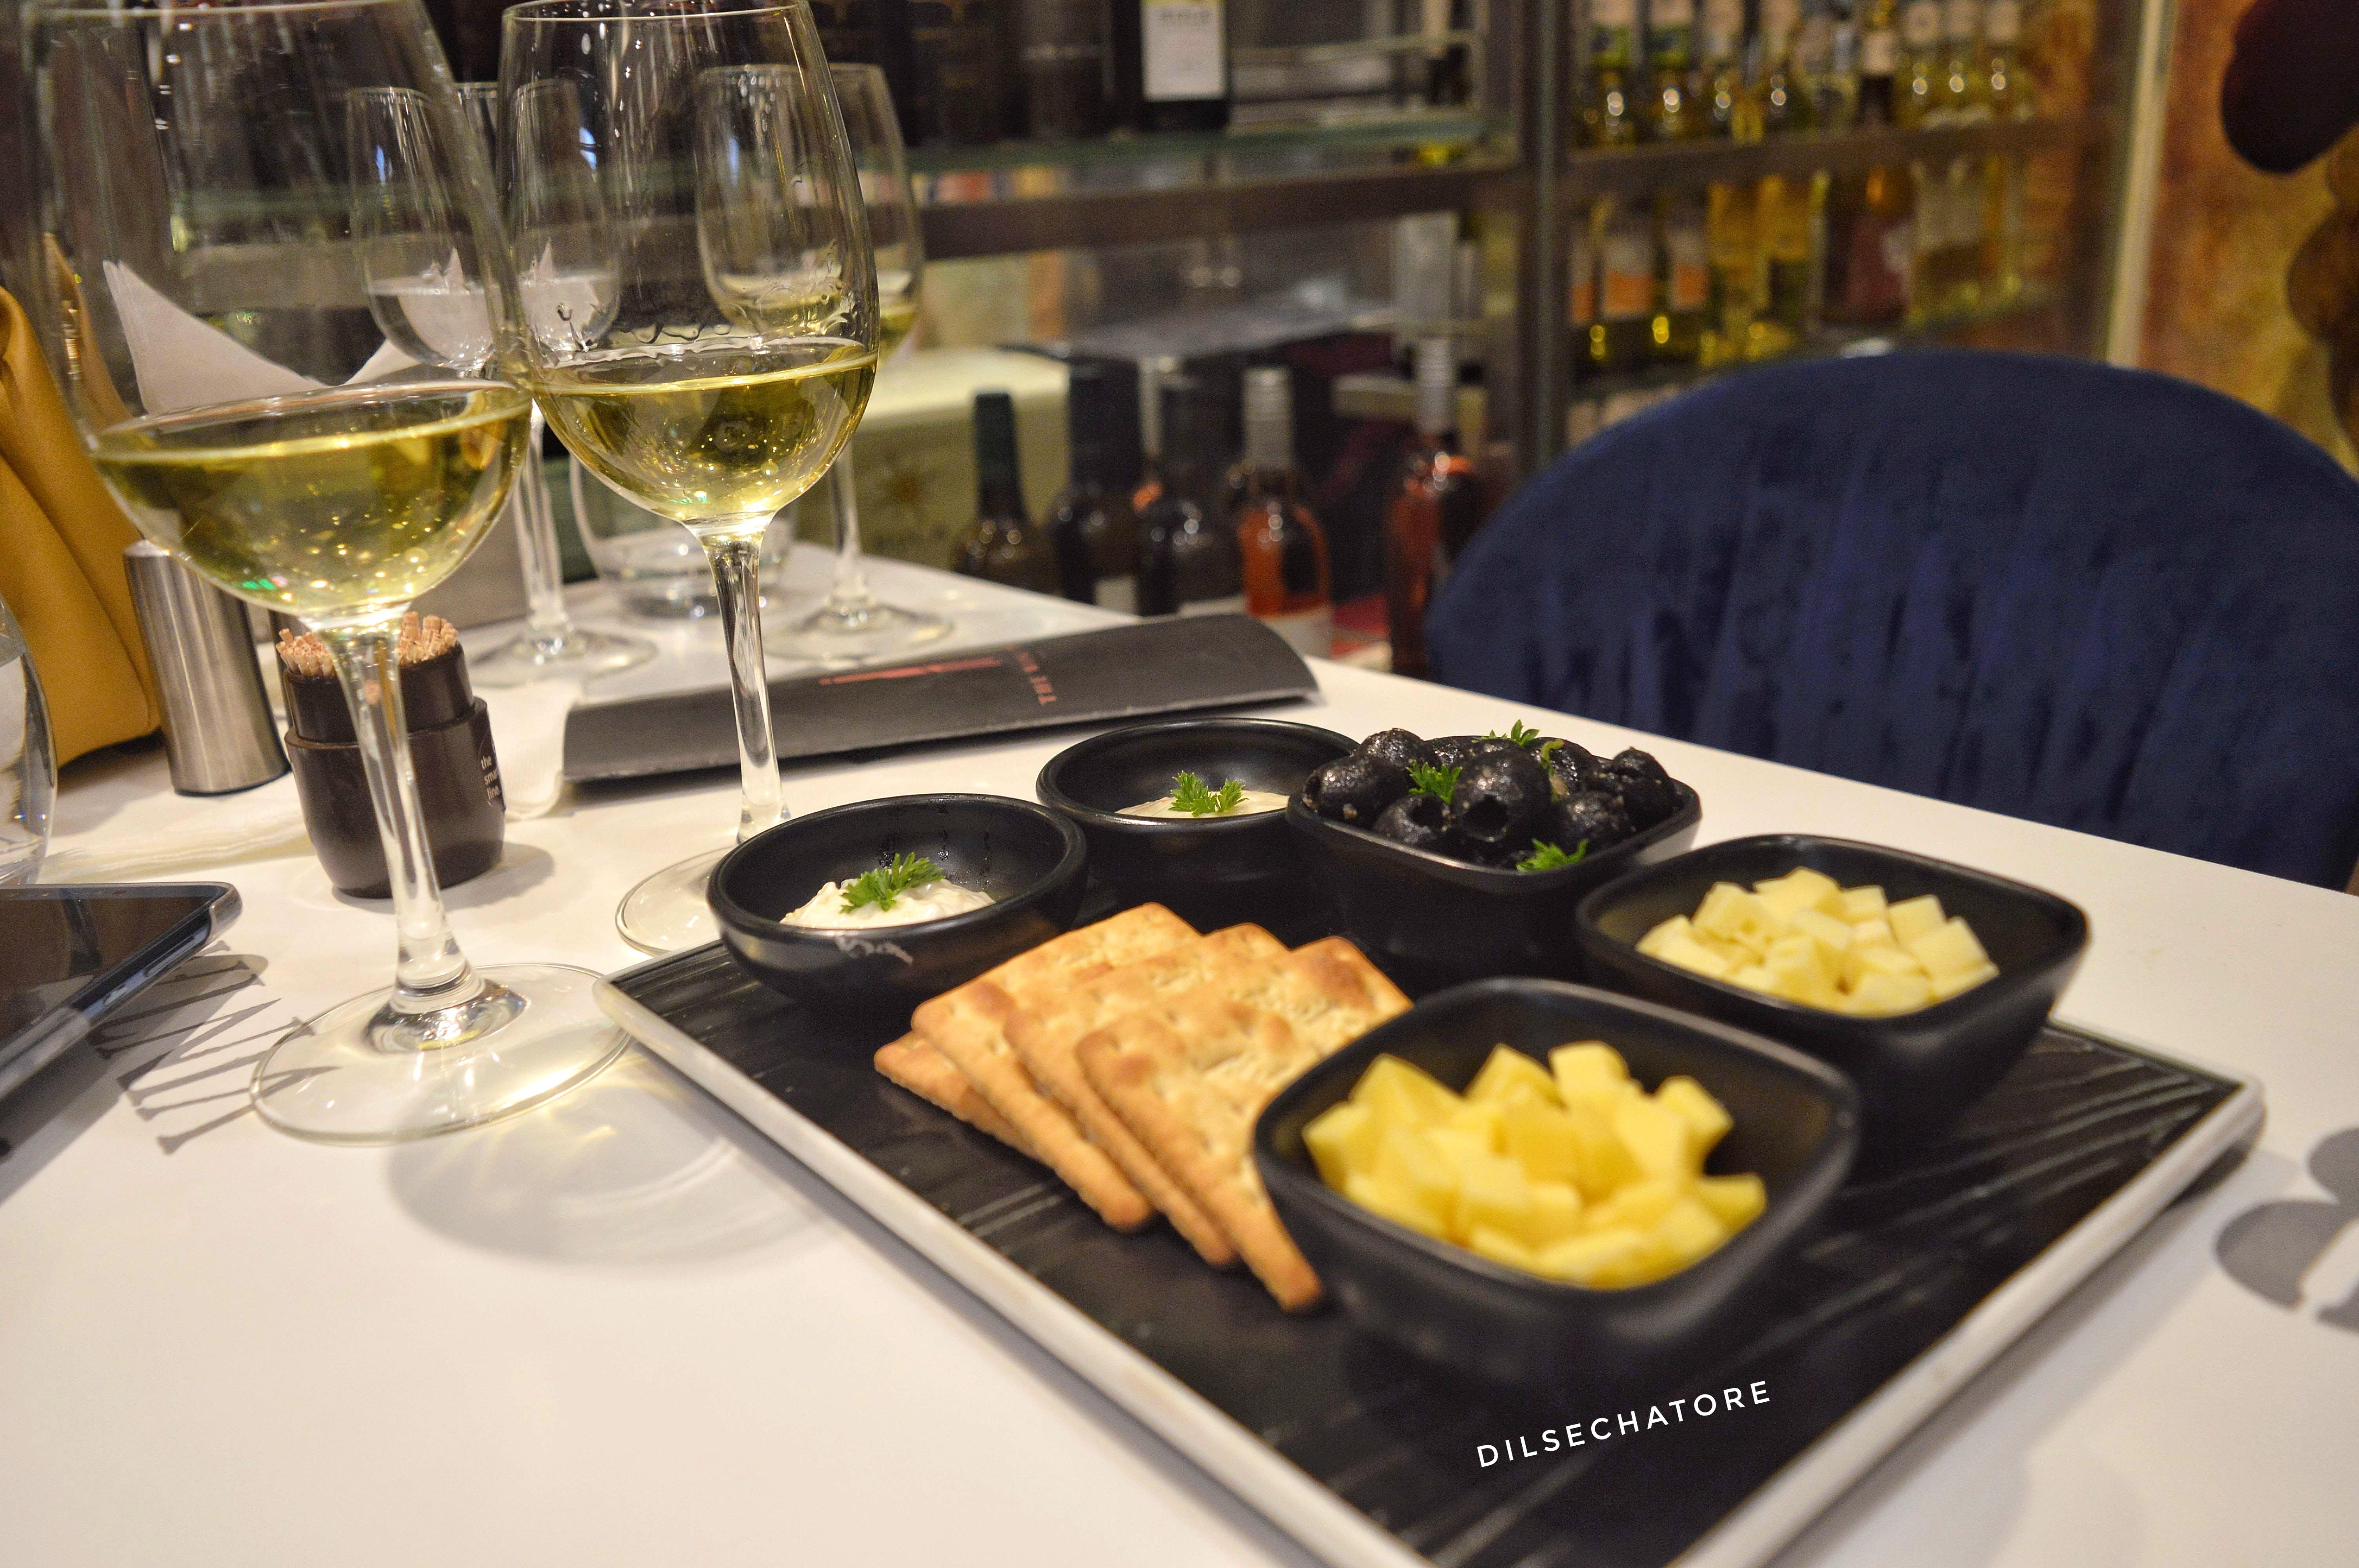 Dish,Food,Cuisine,Meal,Ingredient,Wine,Brunch,À la carte food,Wine glass,appetizer